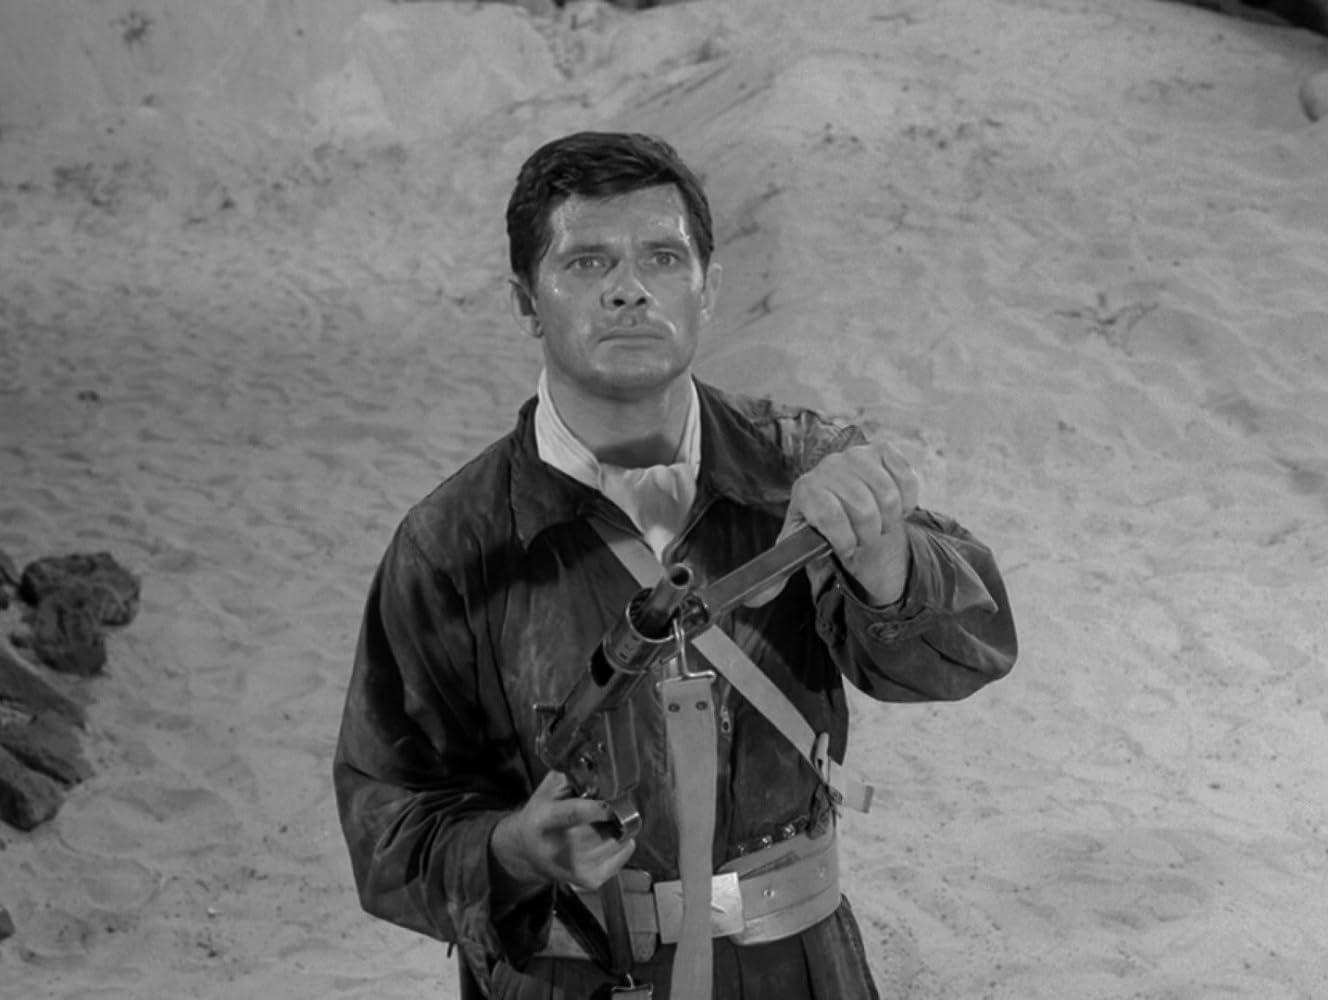 Dewey Martin in The Twilight Zone (1959)